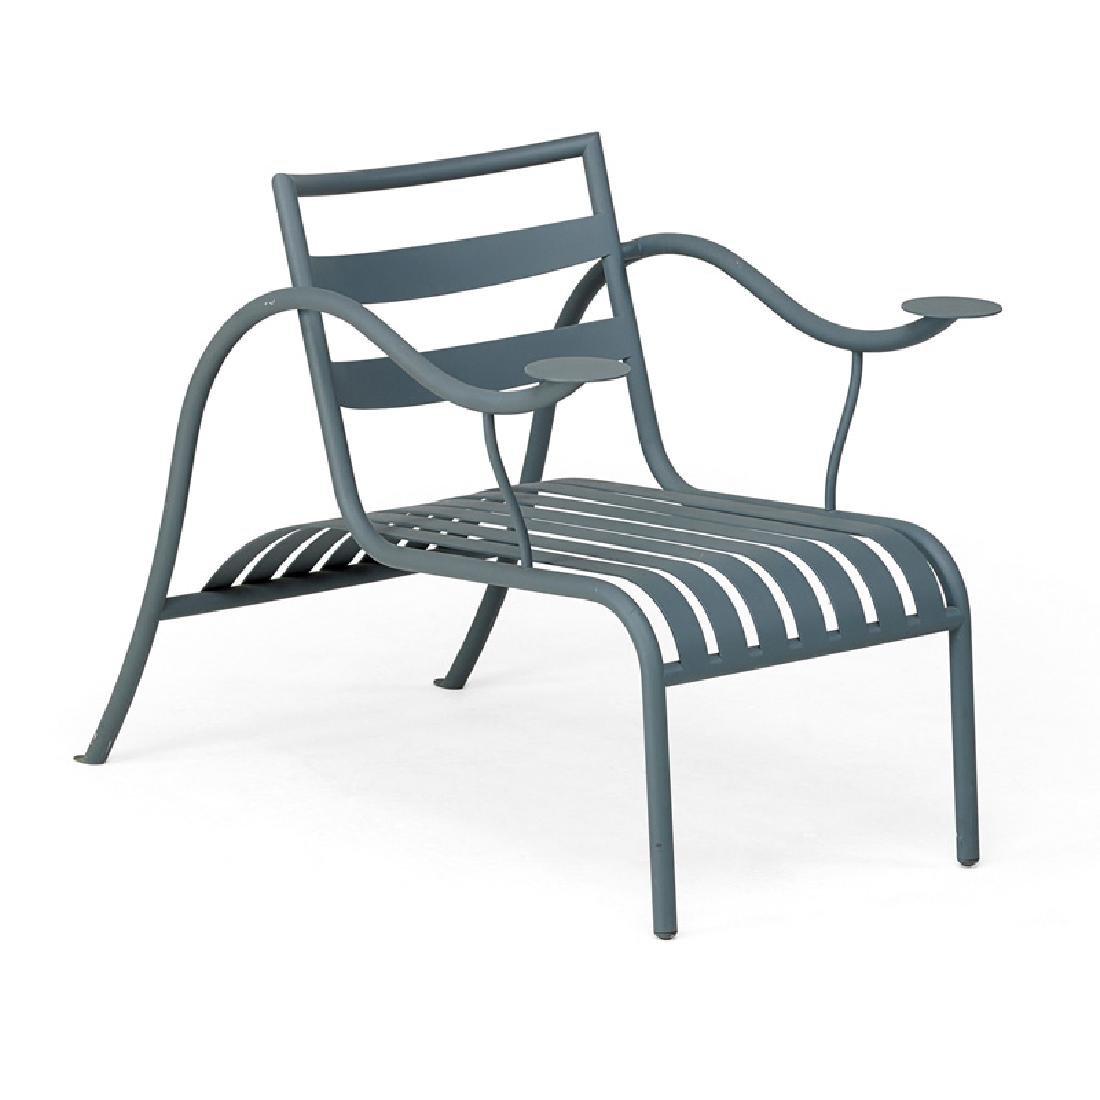 JASPER MORRISON Thinking Man's Chair - 2